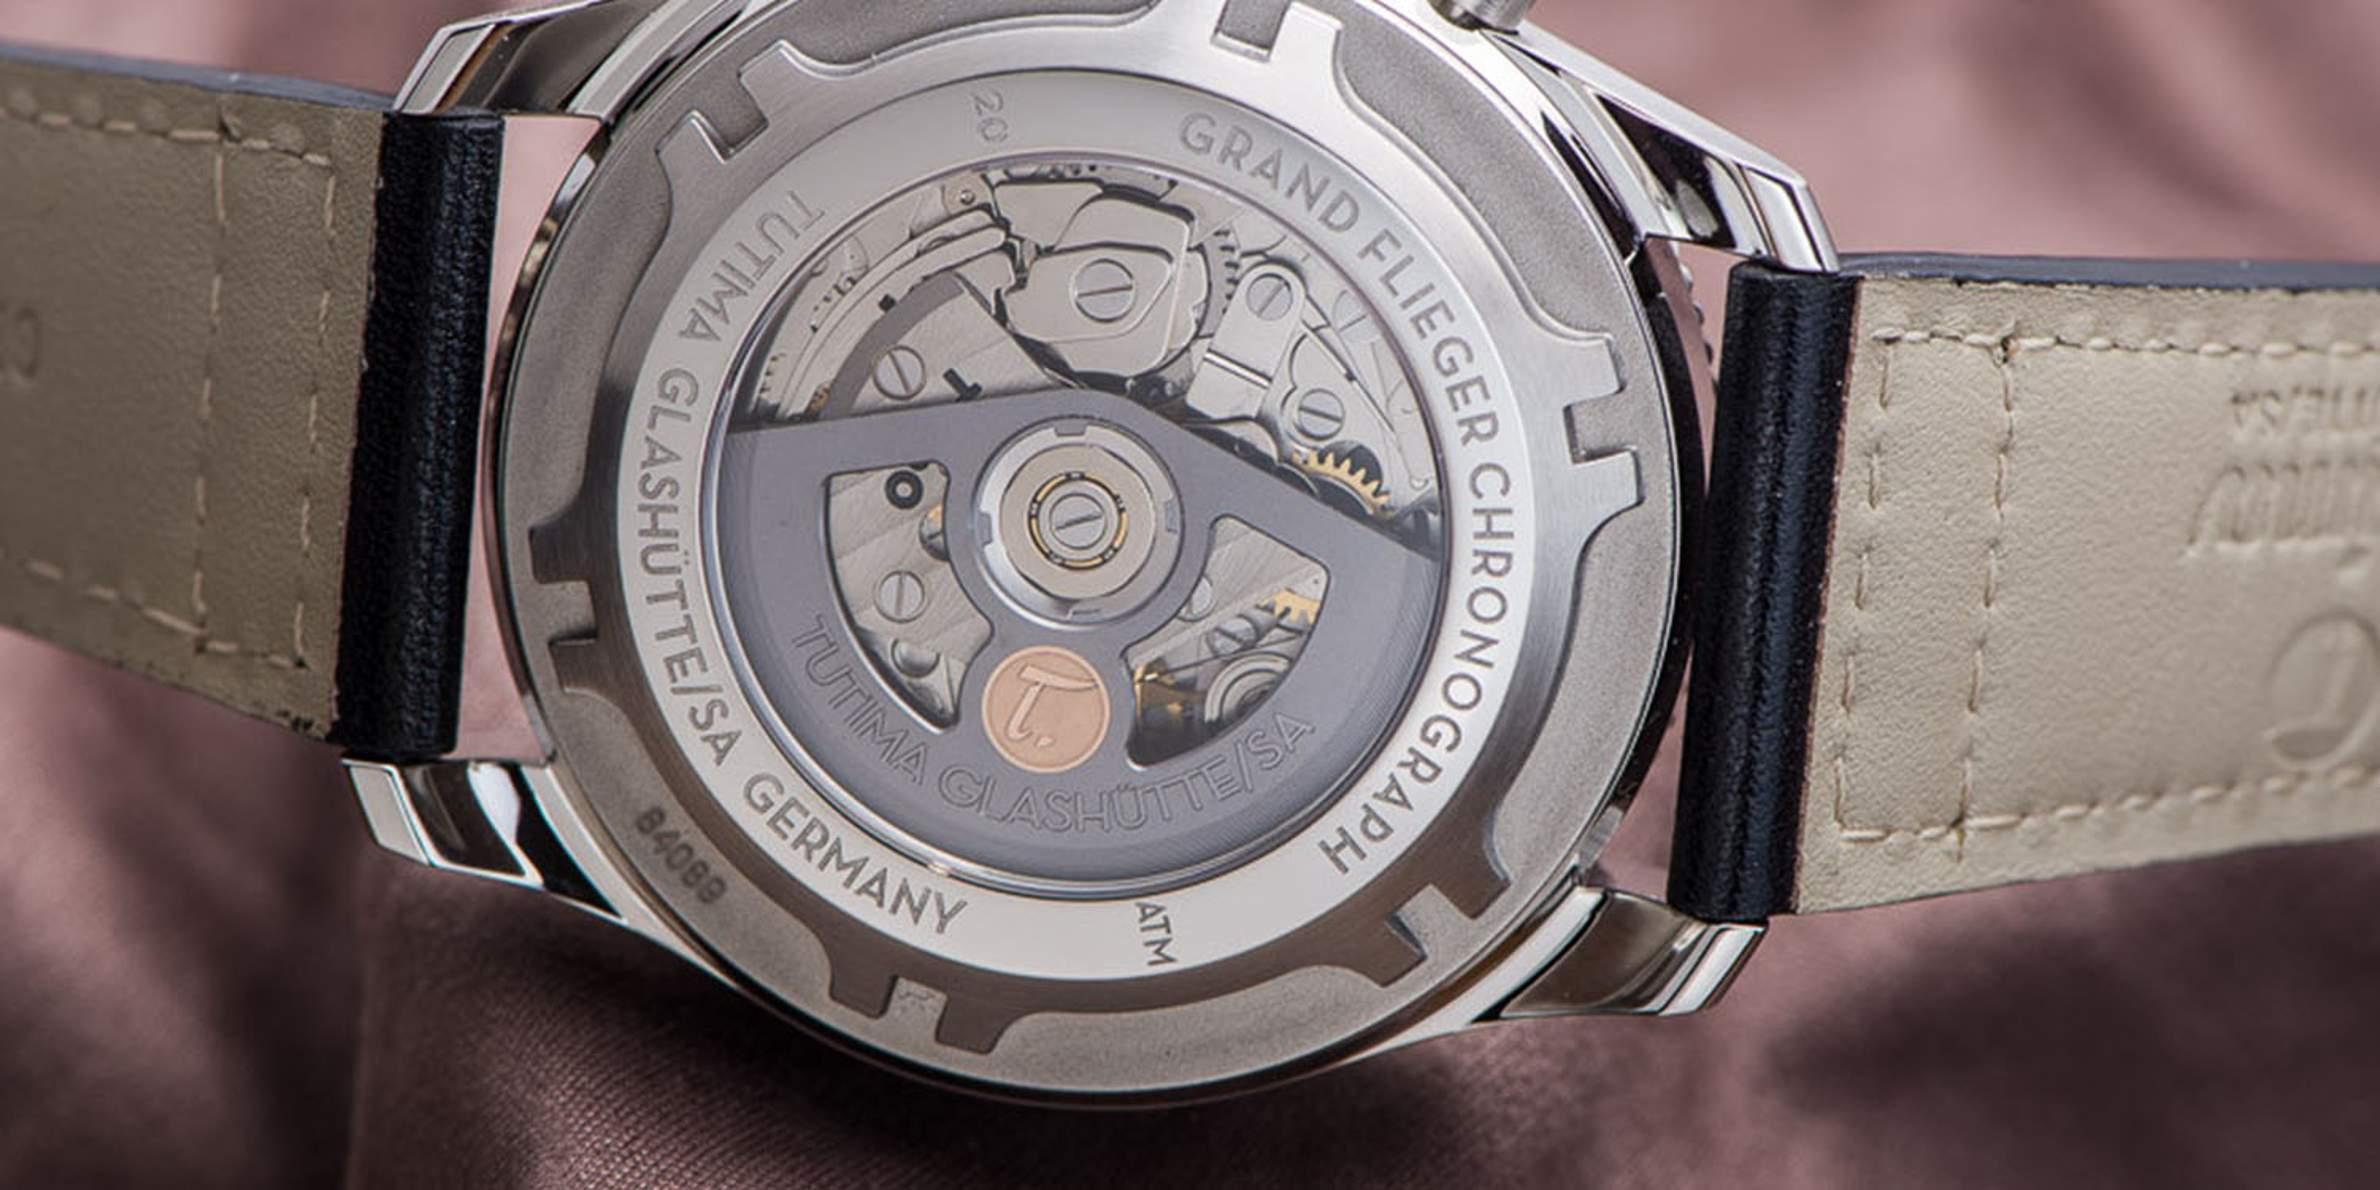 Tutima Grand Flieger Chronograph movement, Image: Bert Buijsrogge